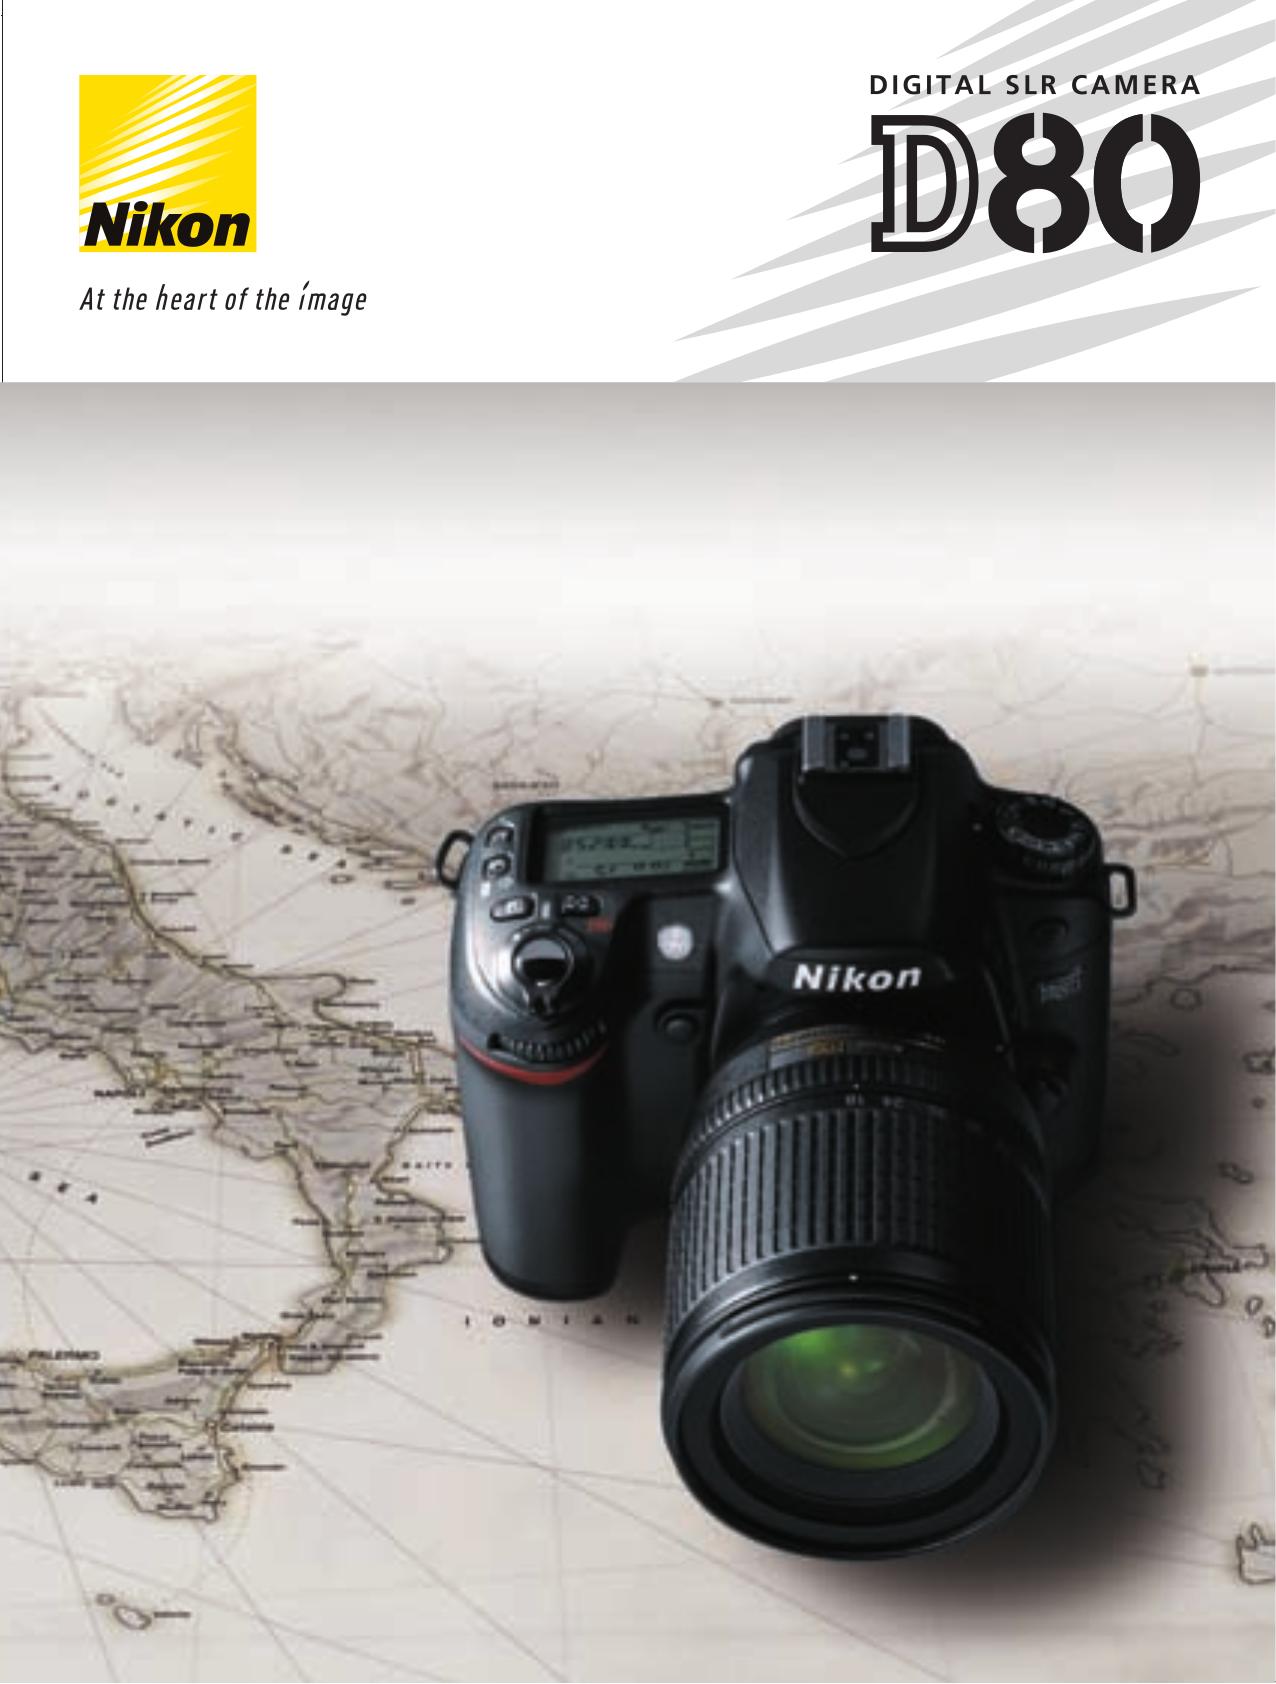 Nikon, iso400, tamron, f4, 2875mm, 66mm, 180s, nikond40, d700, 50mmf18afsg